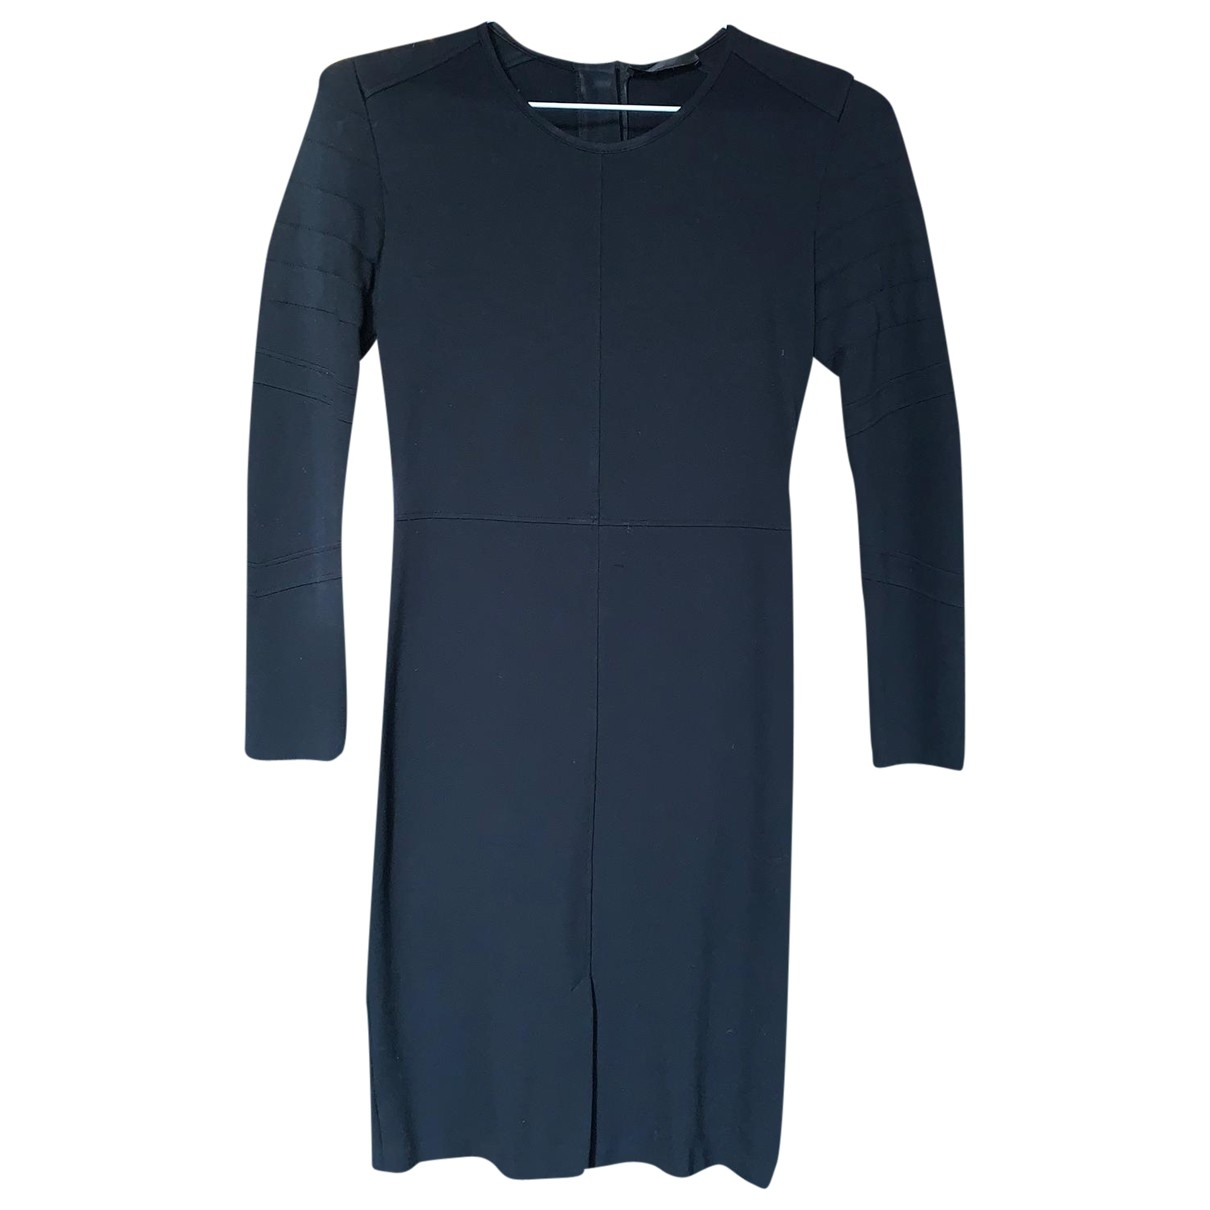 Belstaff \N Kleid in  Schwarz Viskose